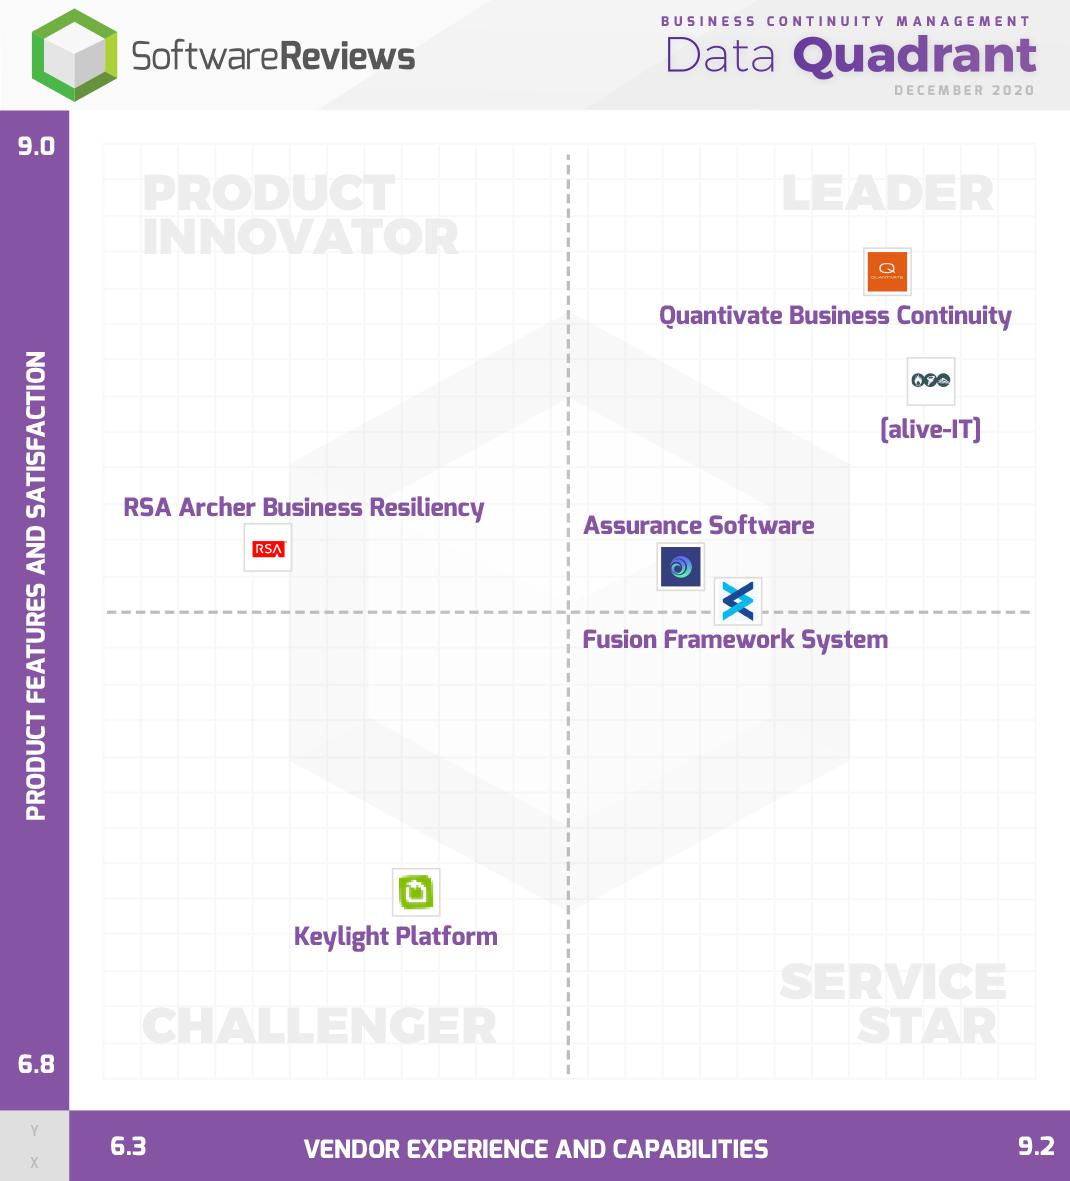 Business Continuity Management Data Quadrant